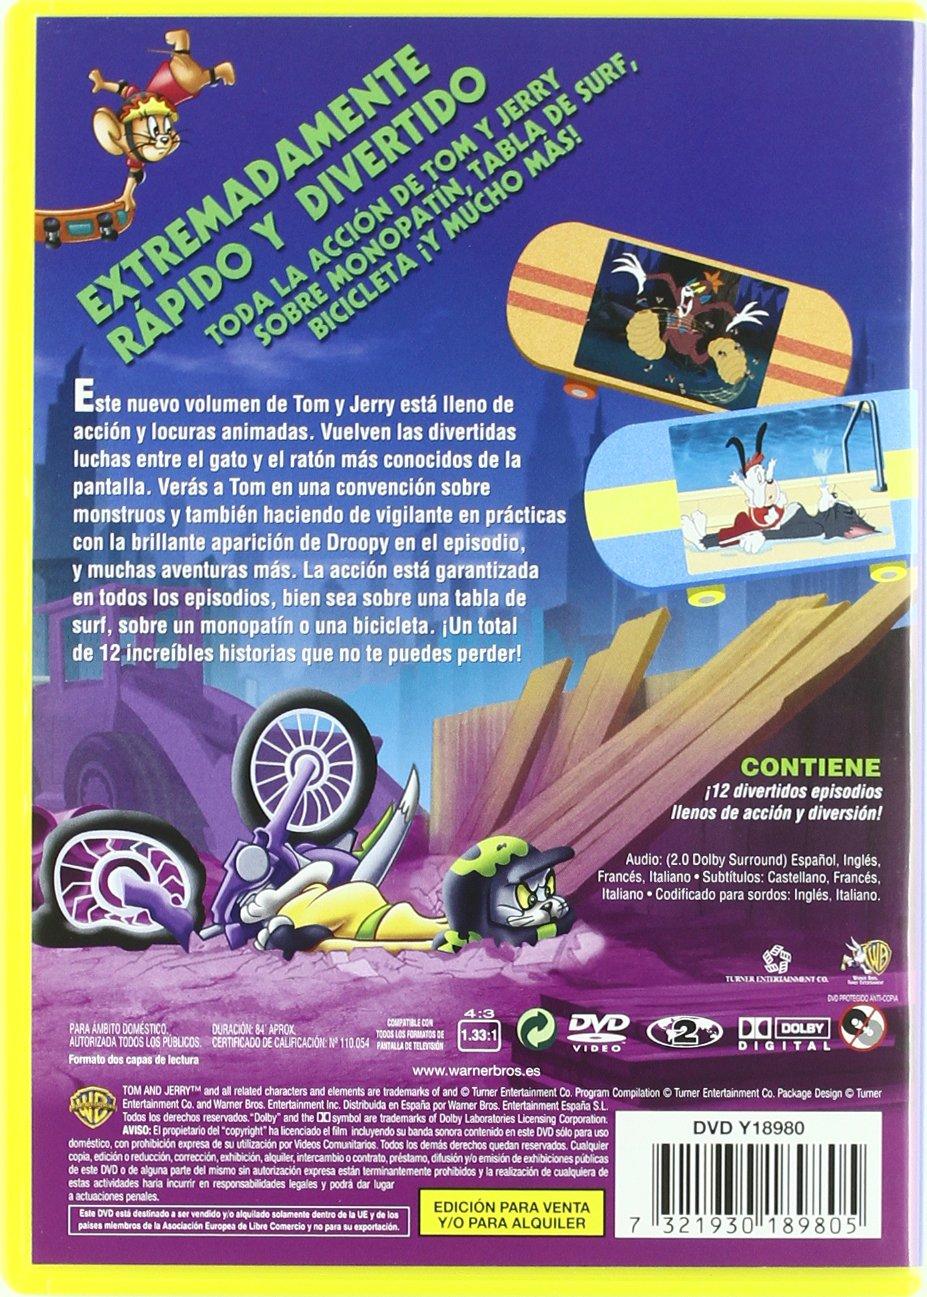 Amazon.com: Tom Y Jerry Locas Aventuras (Import Movie) (European Format - Zone 2) (2008) Varios: Movies & TV